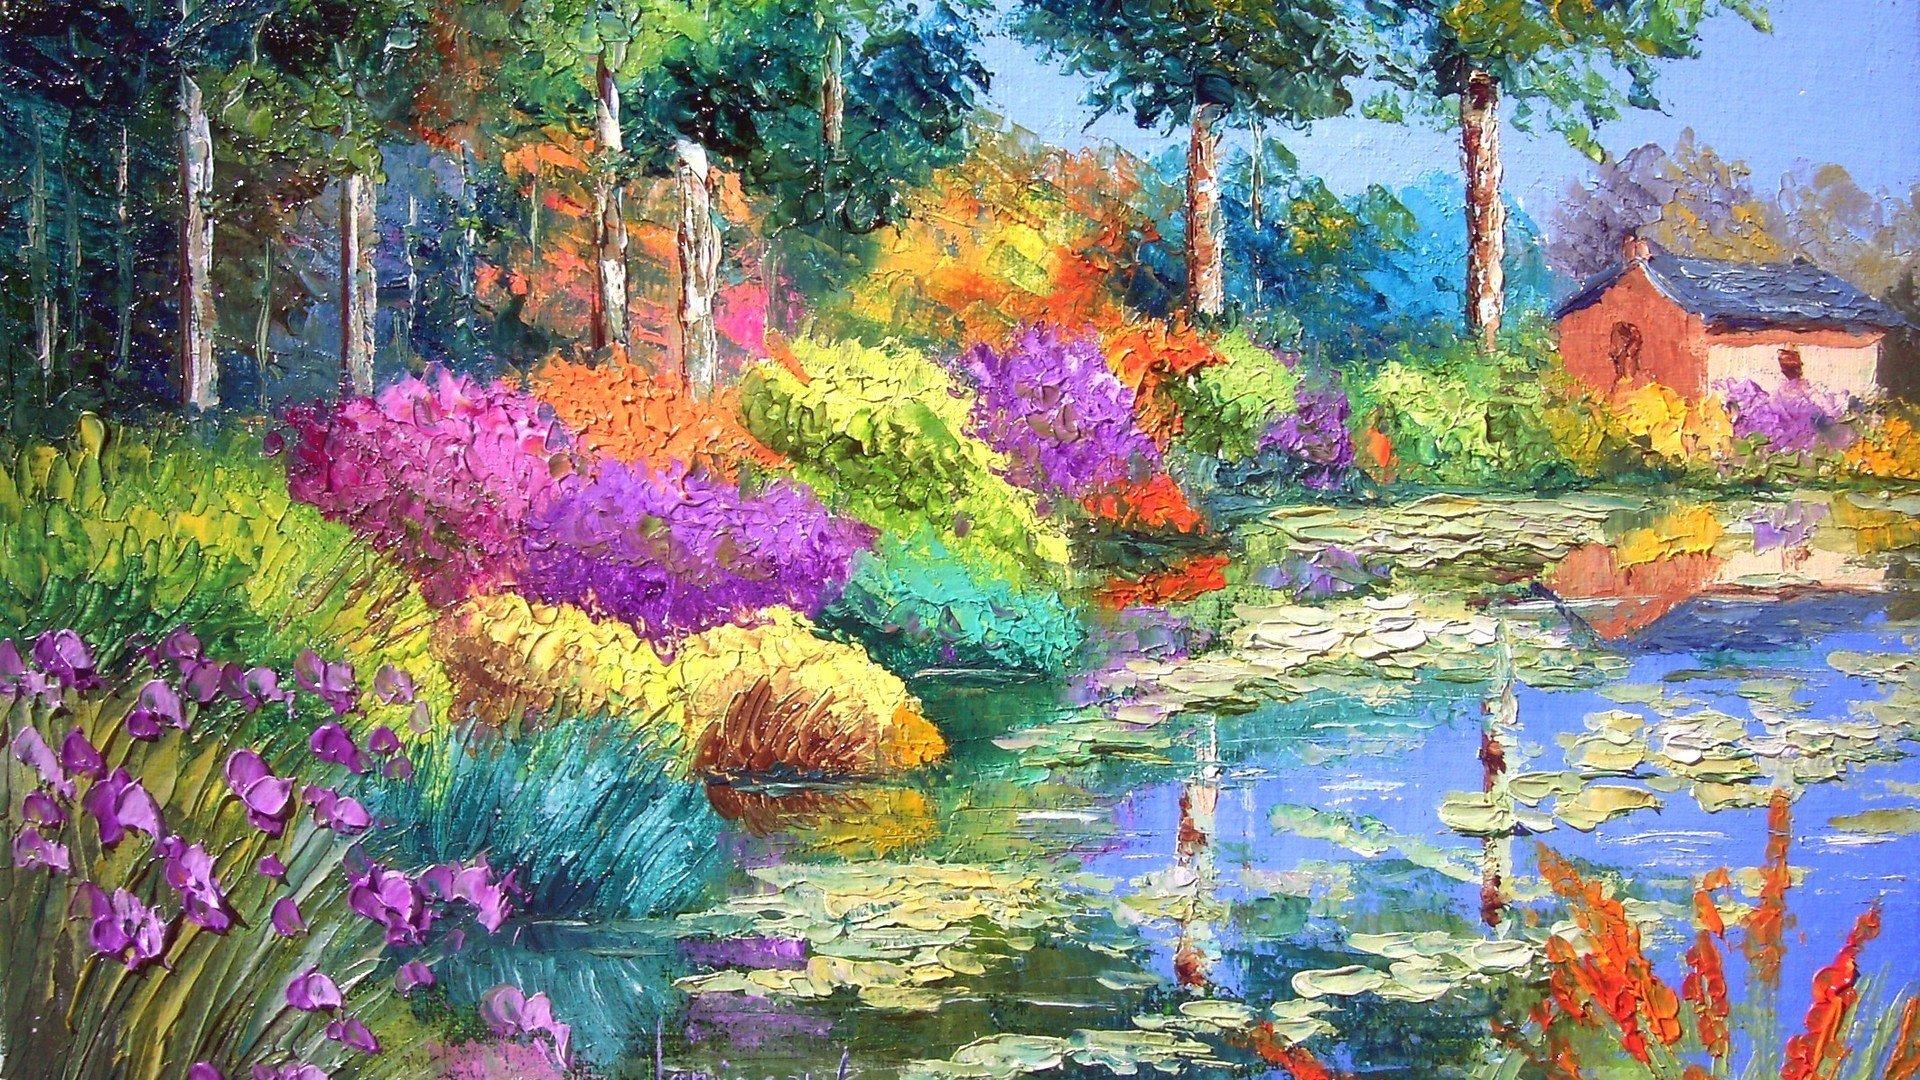 Wallpaper art artistic painting painters 24 1920x1080